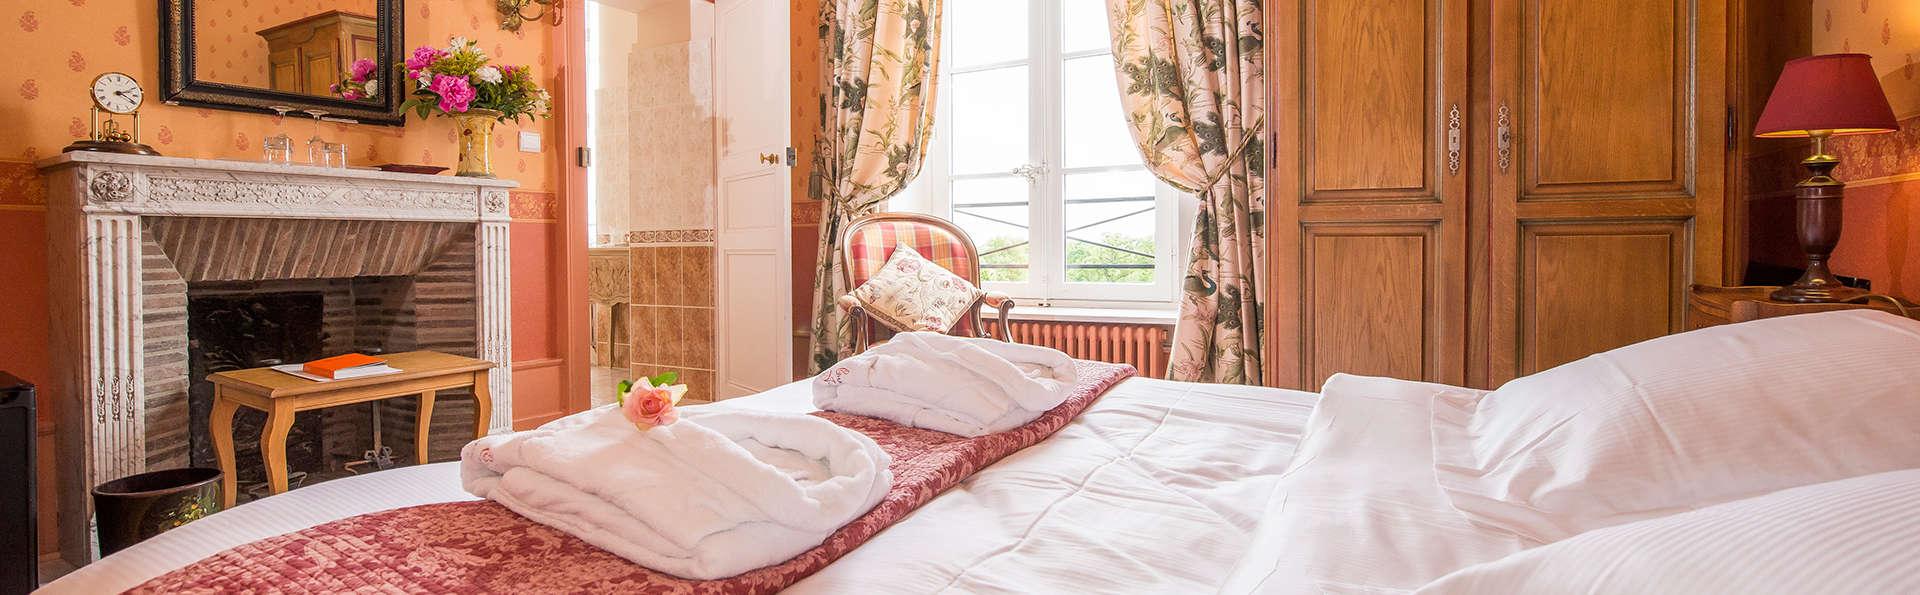 Château d'Ygrande  - EDIT_room1.jpg